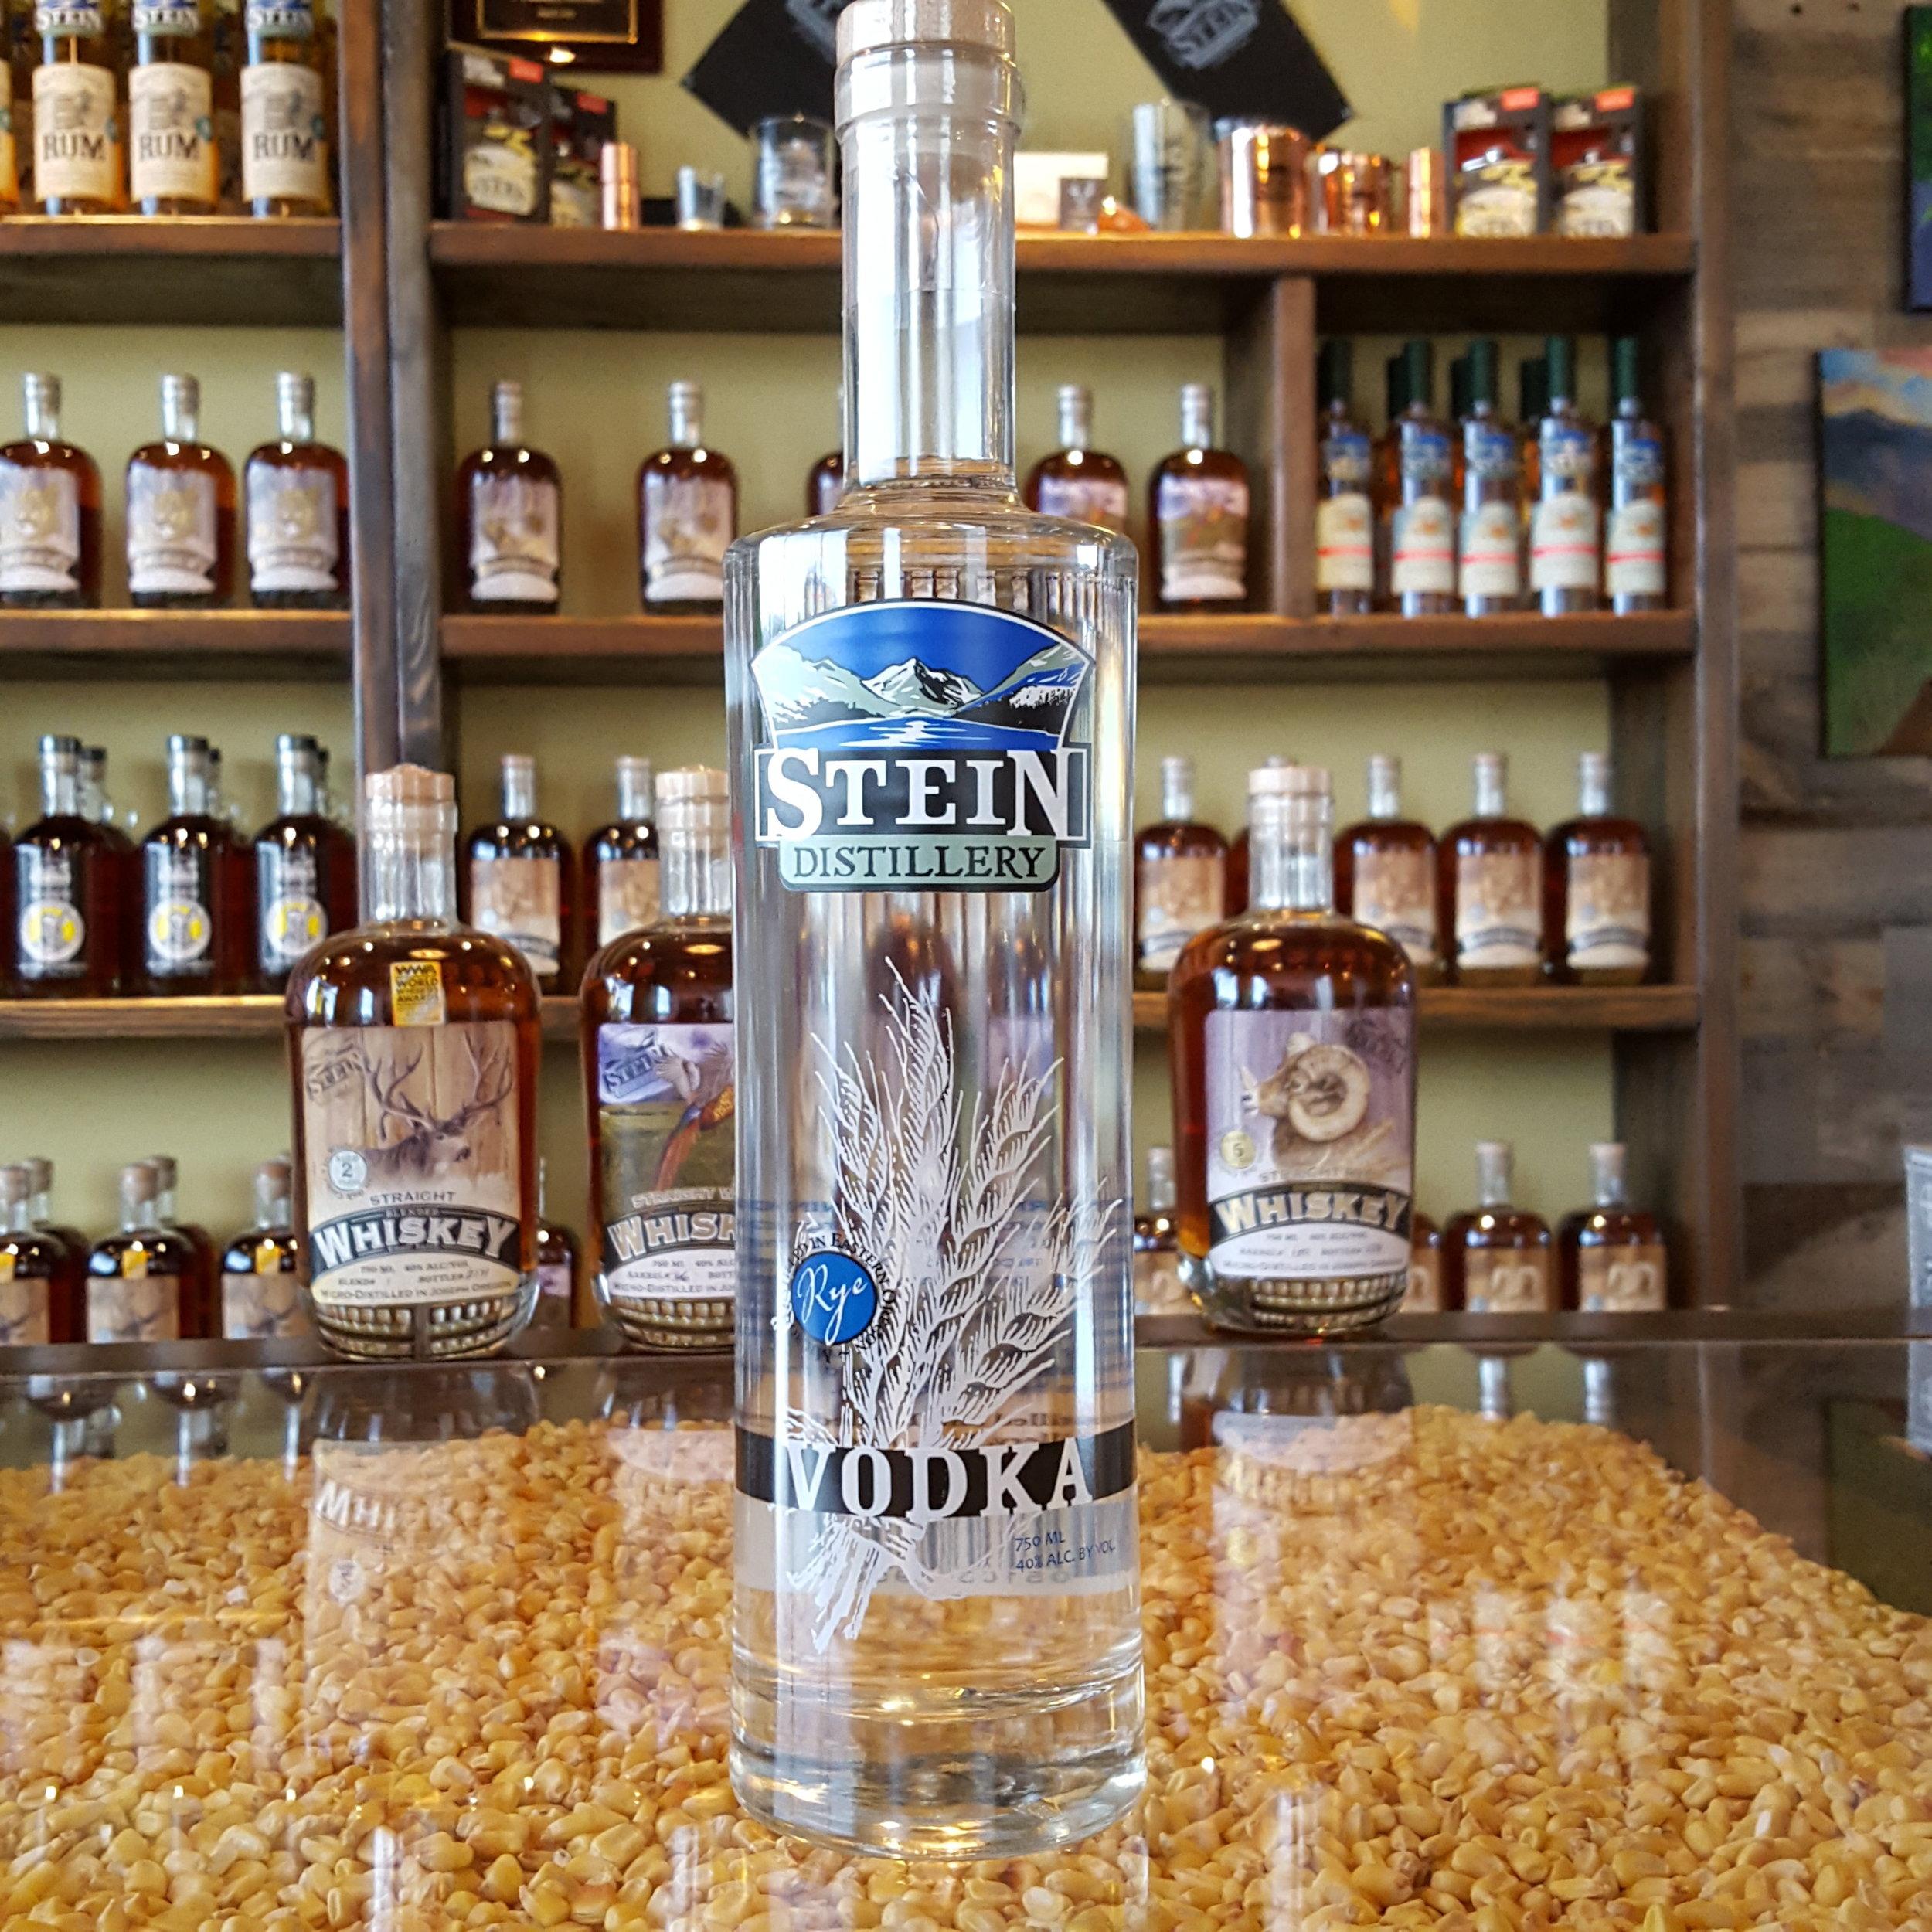 Stein Rye Vodka - OLCC Code: 7408B